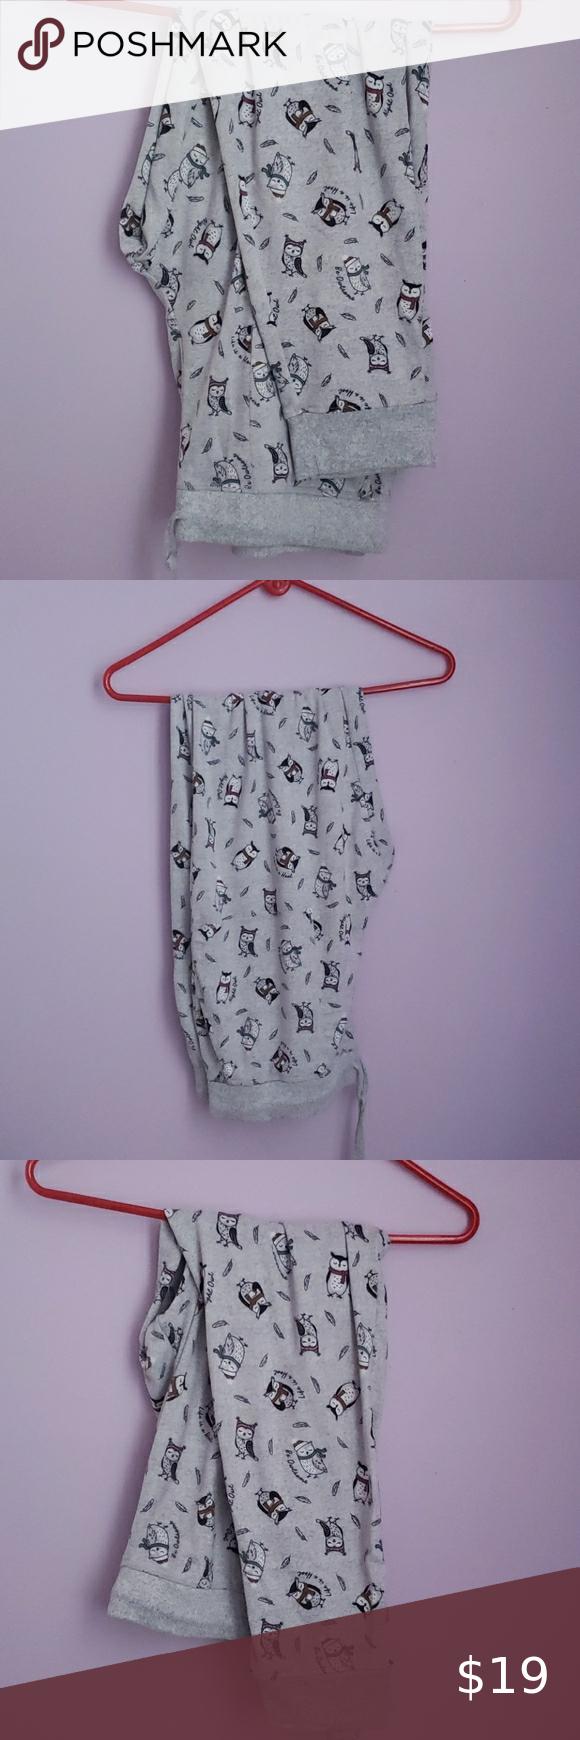 Gray Night Owl Jogger Pajama Pants Secret Treasur In 2020 Clothes Design Fashion Tips Pajama Pants